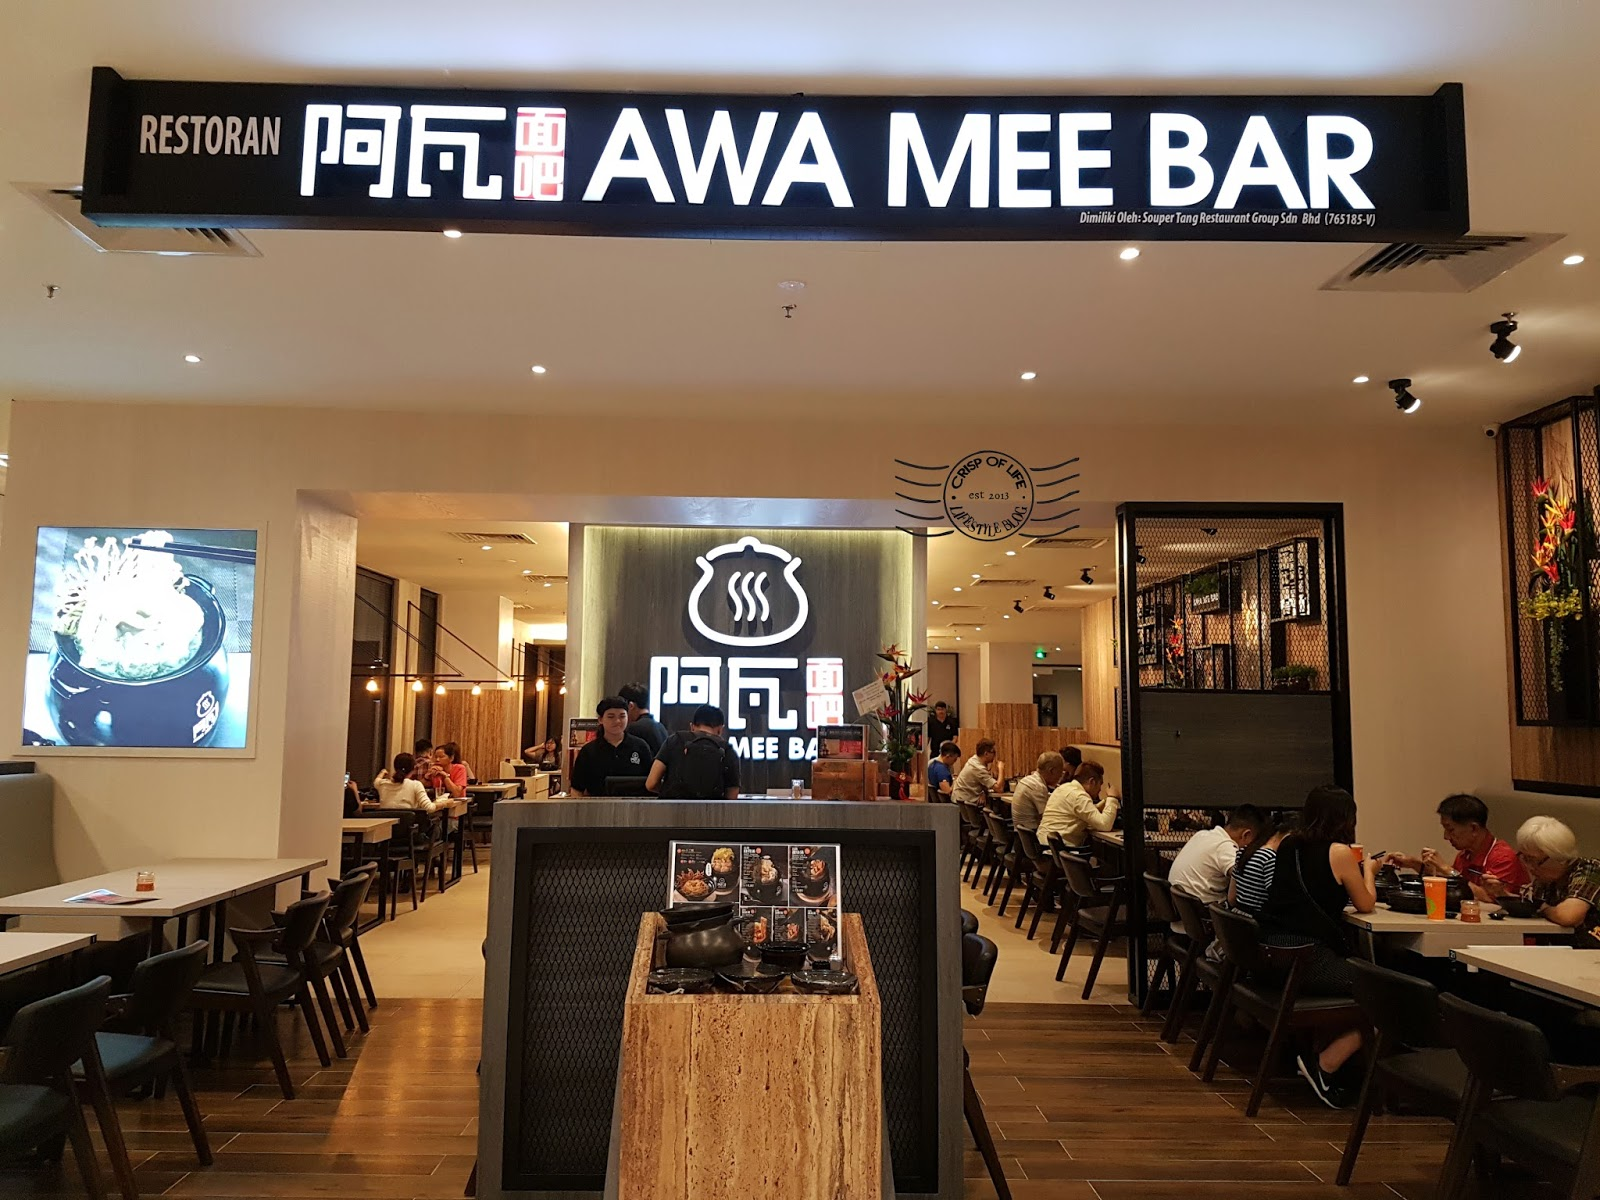 AWA Mee Bar 阿瓦面吧 @ Gurney Plaza, Penang